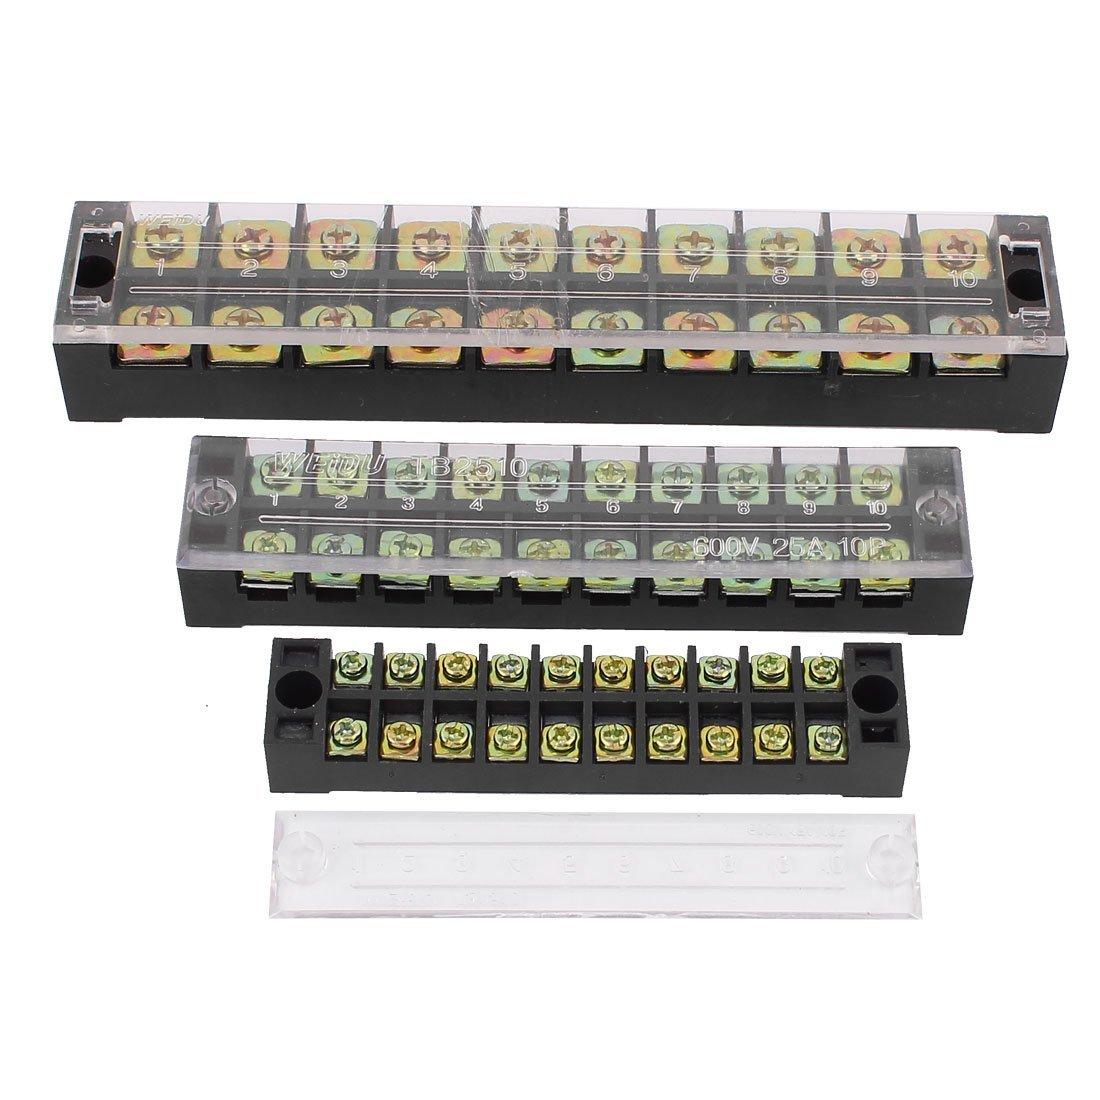 3Pcs 600V 15A/25A/45A 2 Row 10 Positions Barrier Terminal Strip Block